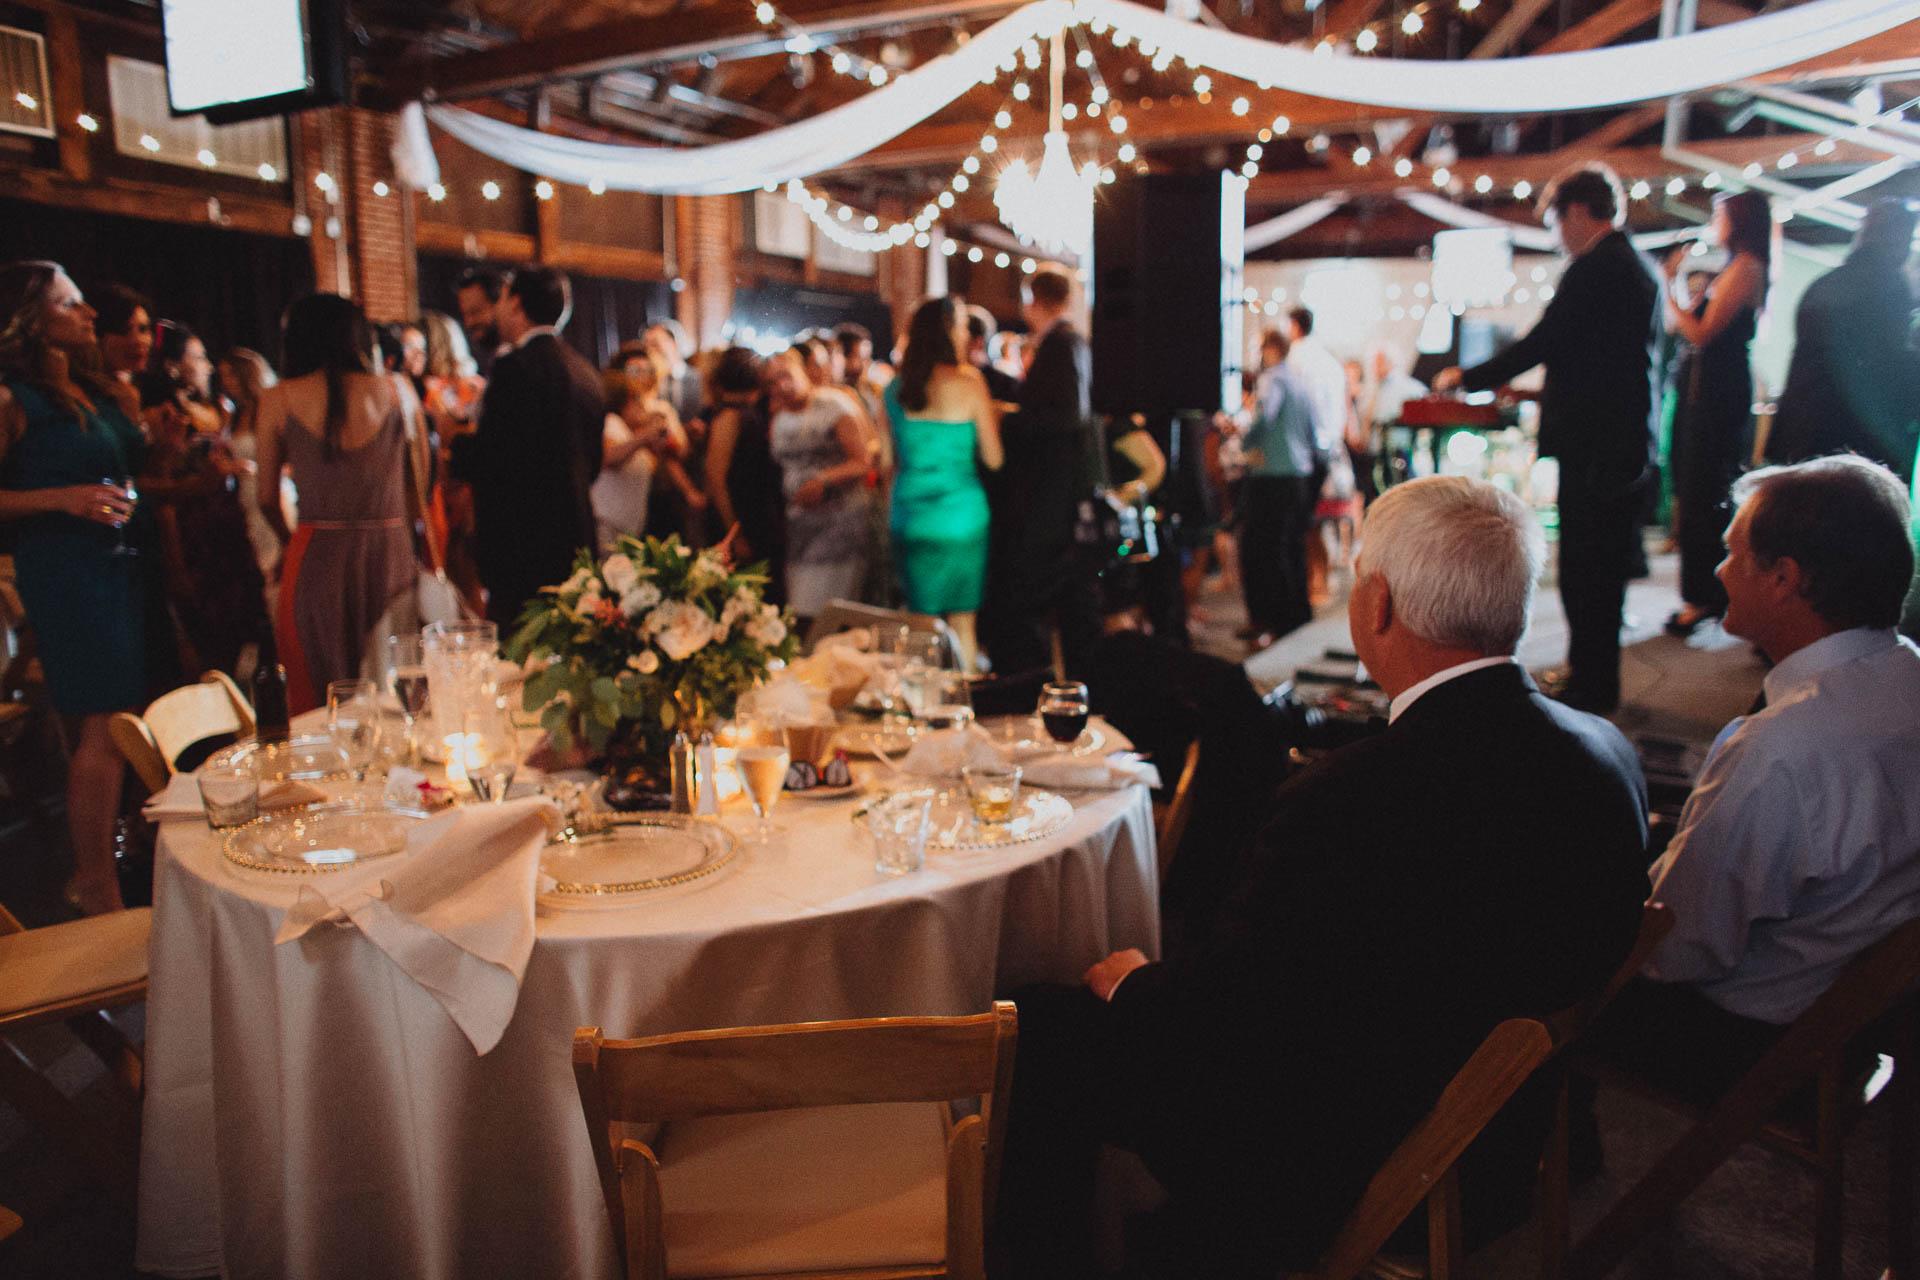 Keri-Joseph-Top-of-the-Market-Wedding-188@2x.jpg